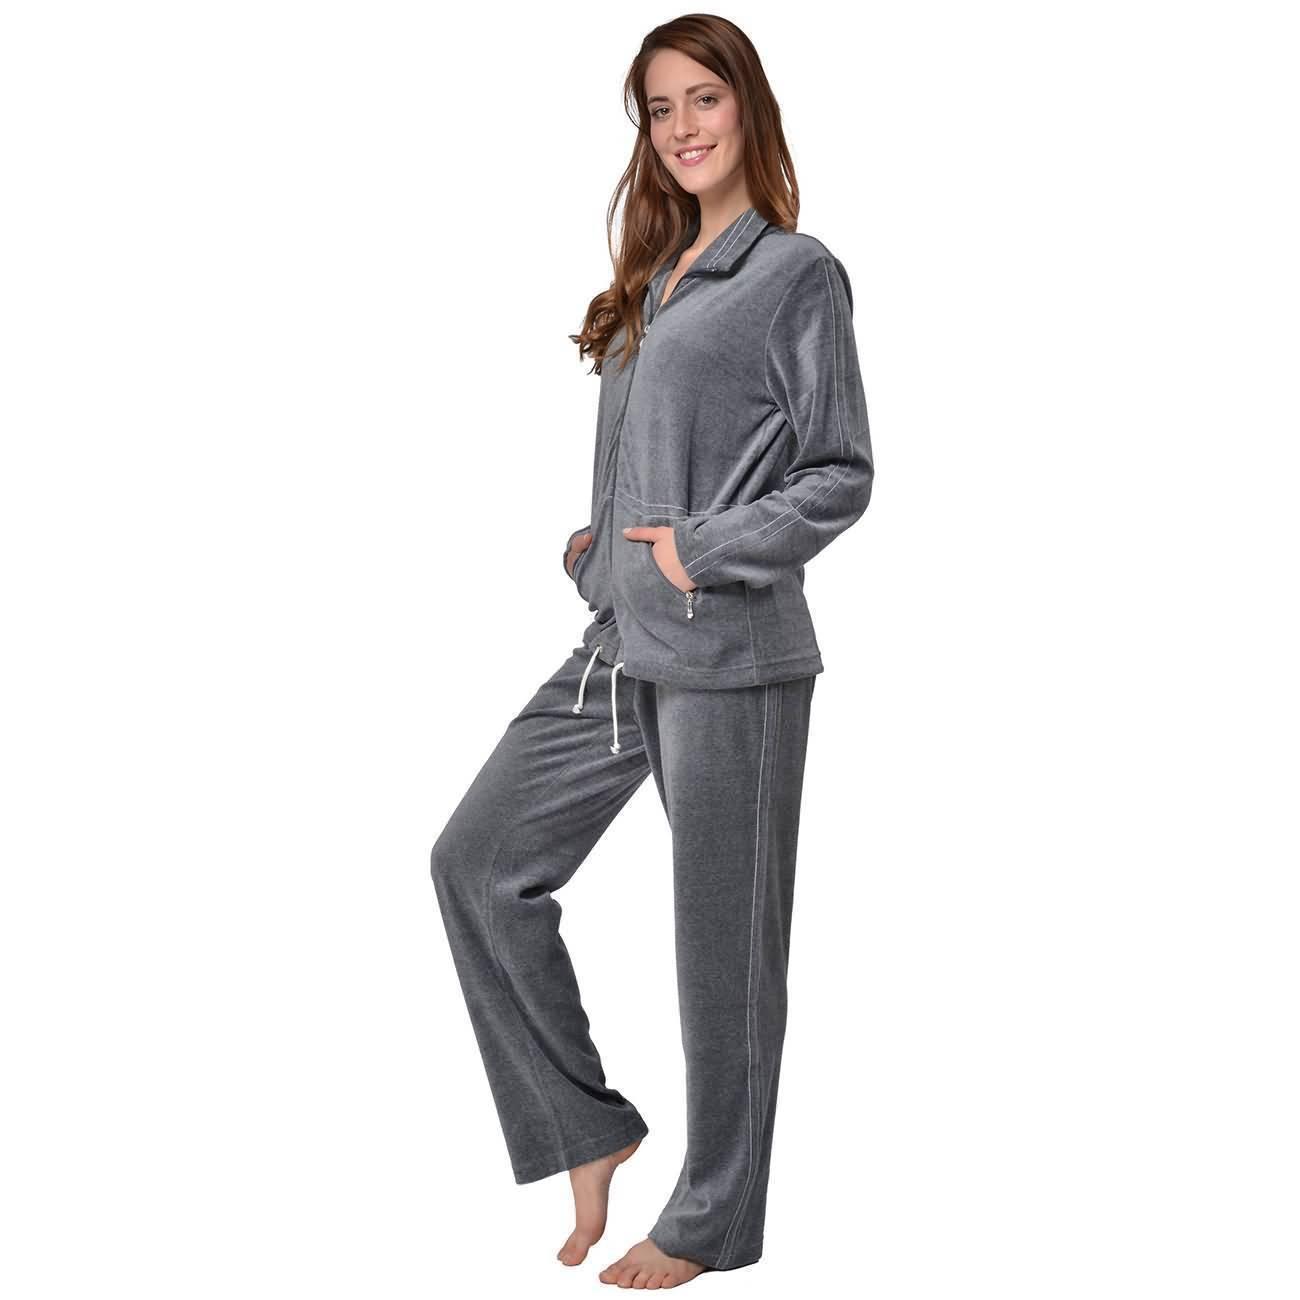 Freizeitanzug Damen Hausanzug Velour Fitnessanzug Loungewear Nicki Anzug